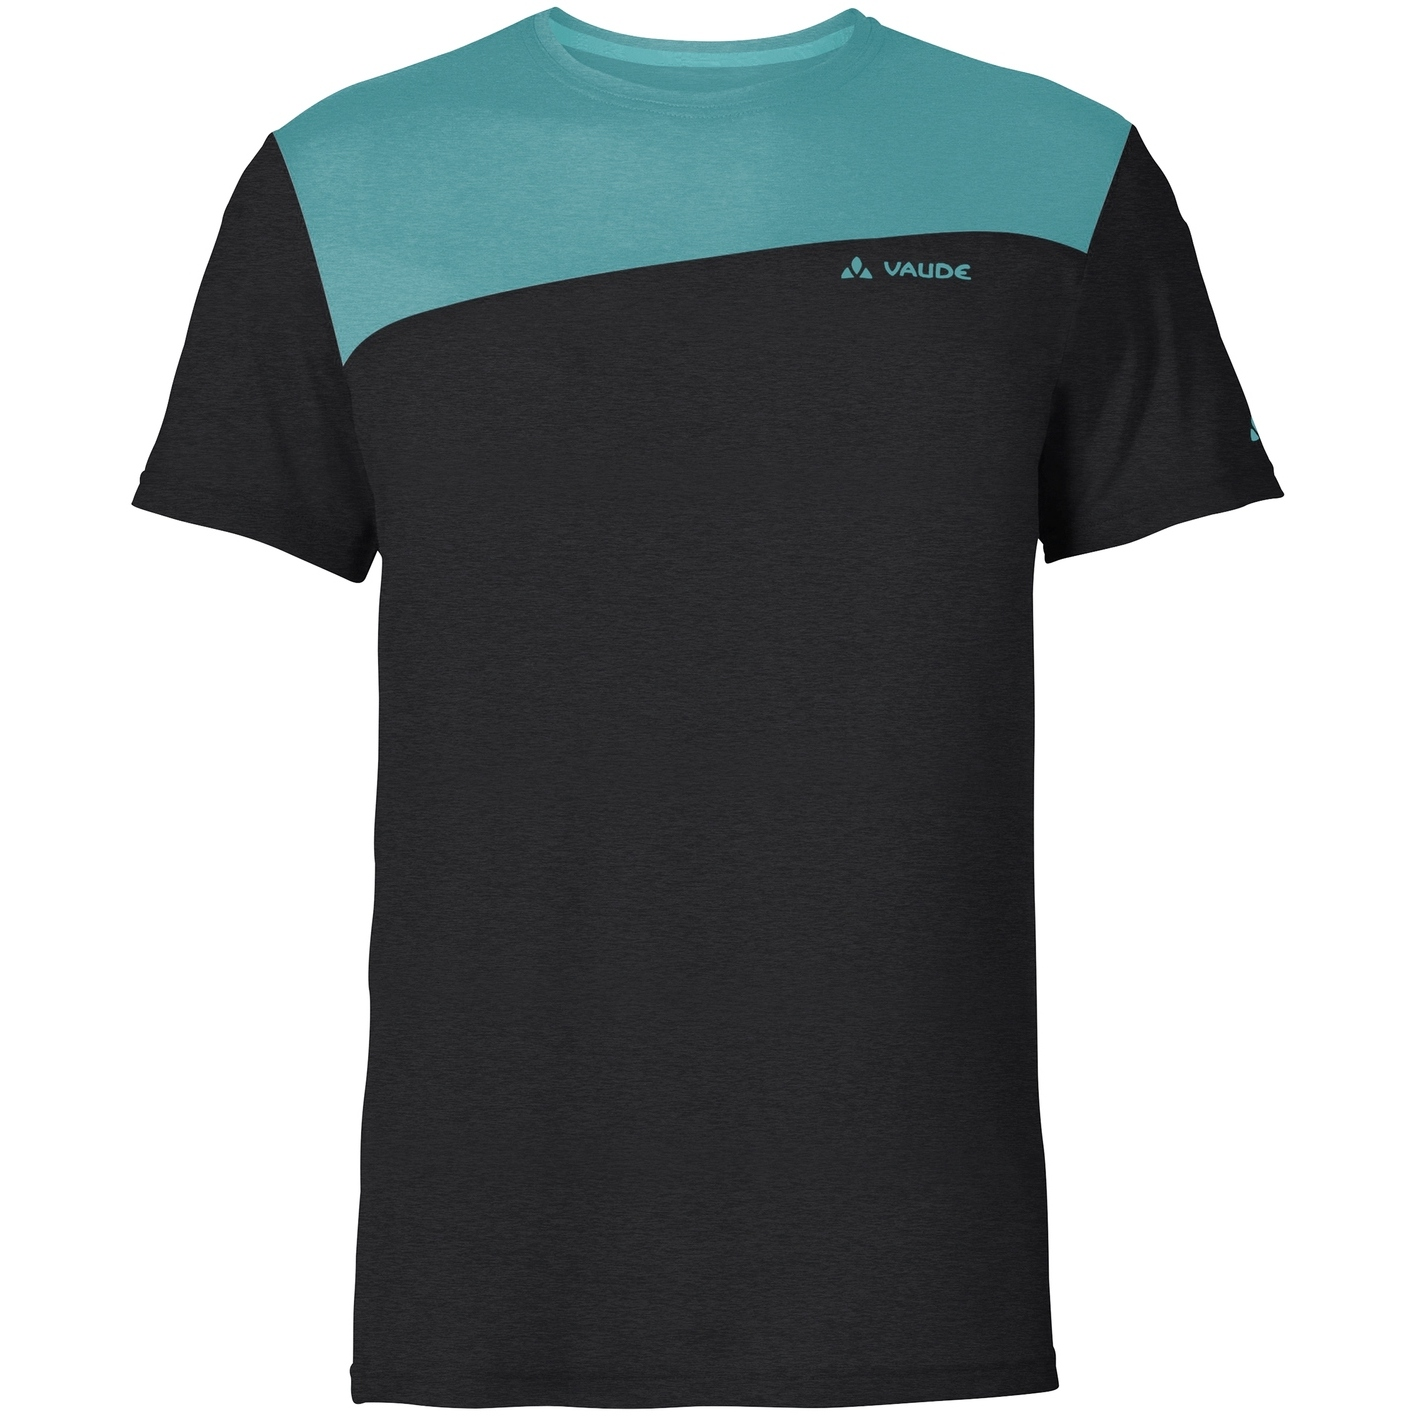 Vaude Sveit T-Shirt - black/lake